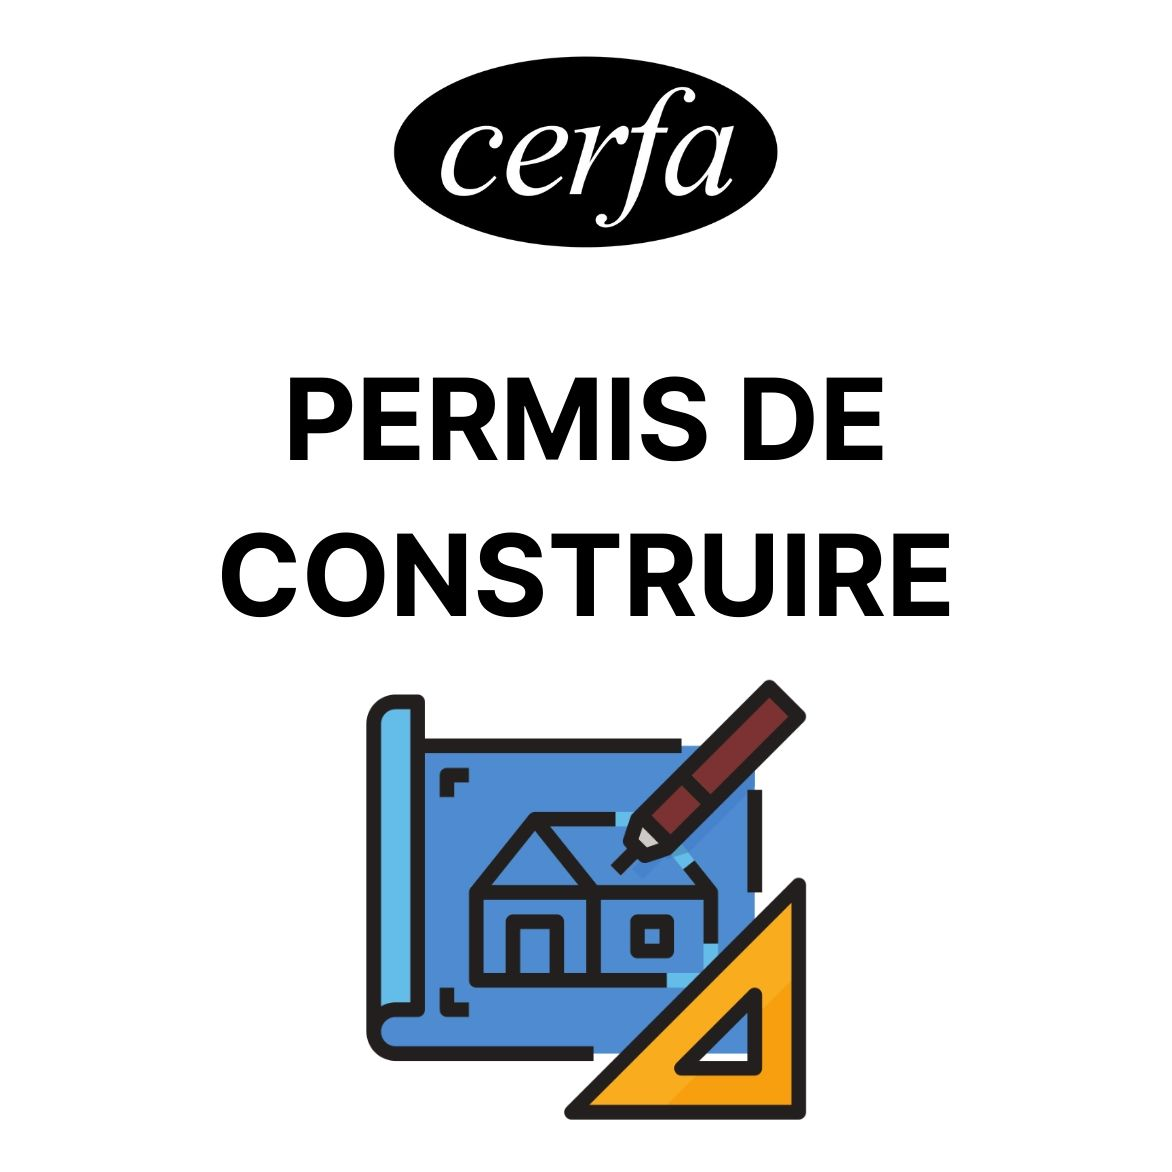 CERFA PERMIS CONSTRUIRE